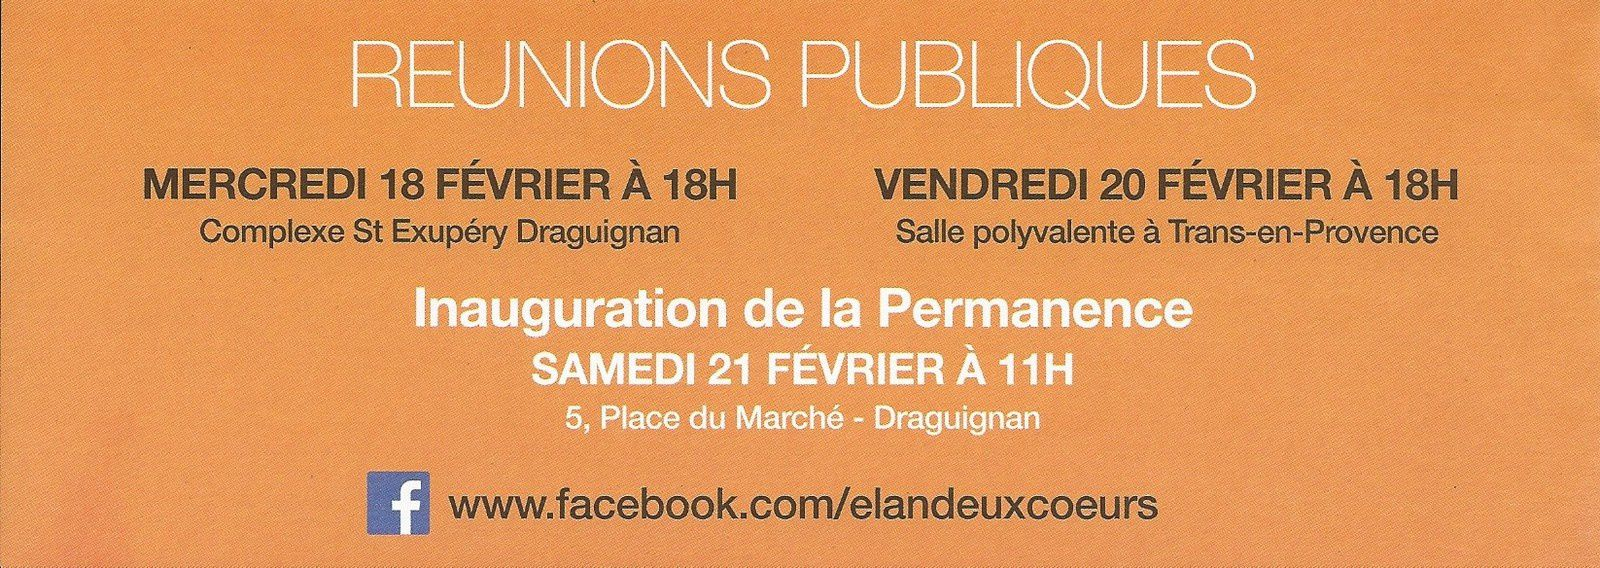 sur Facebook : www.facebook.com/elandeuxcoeurs